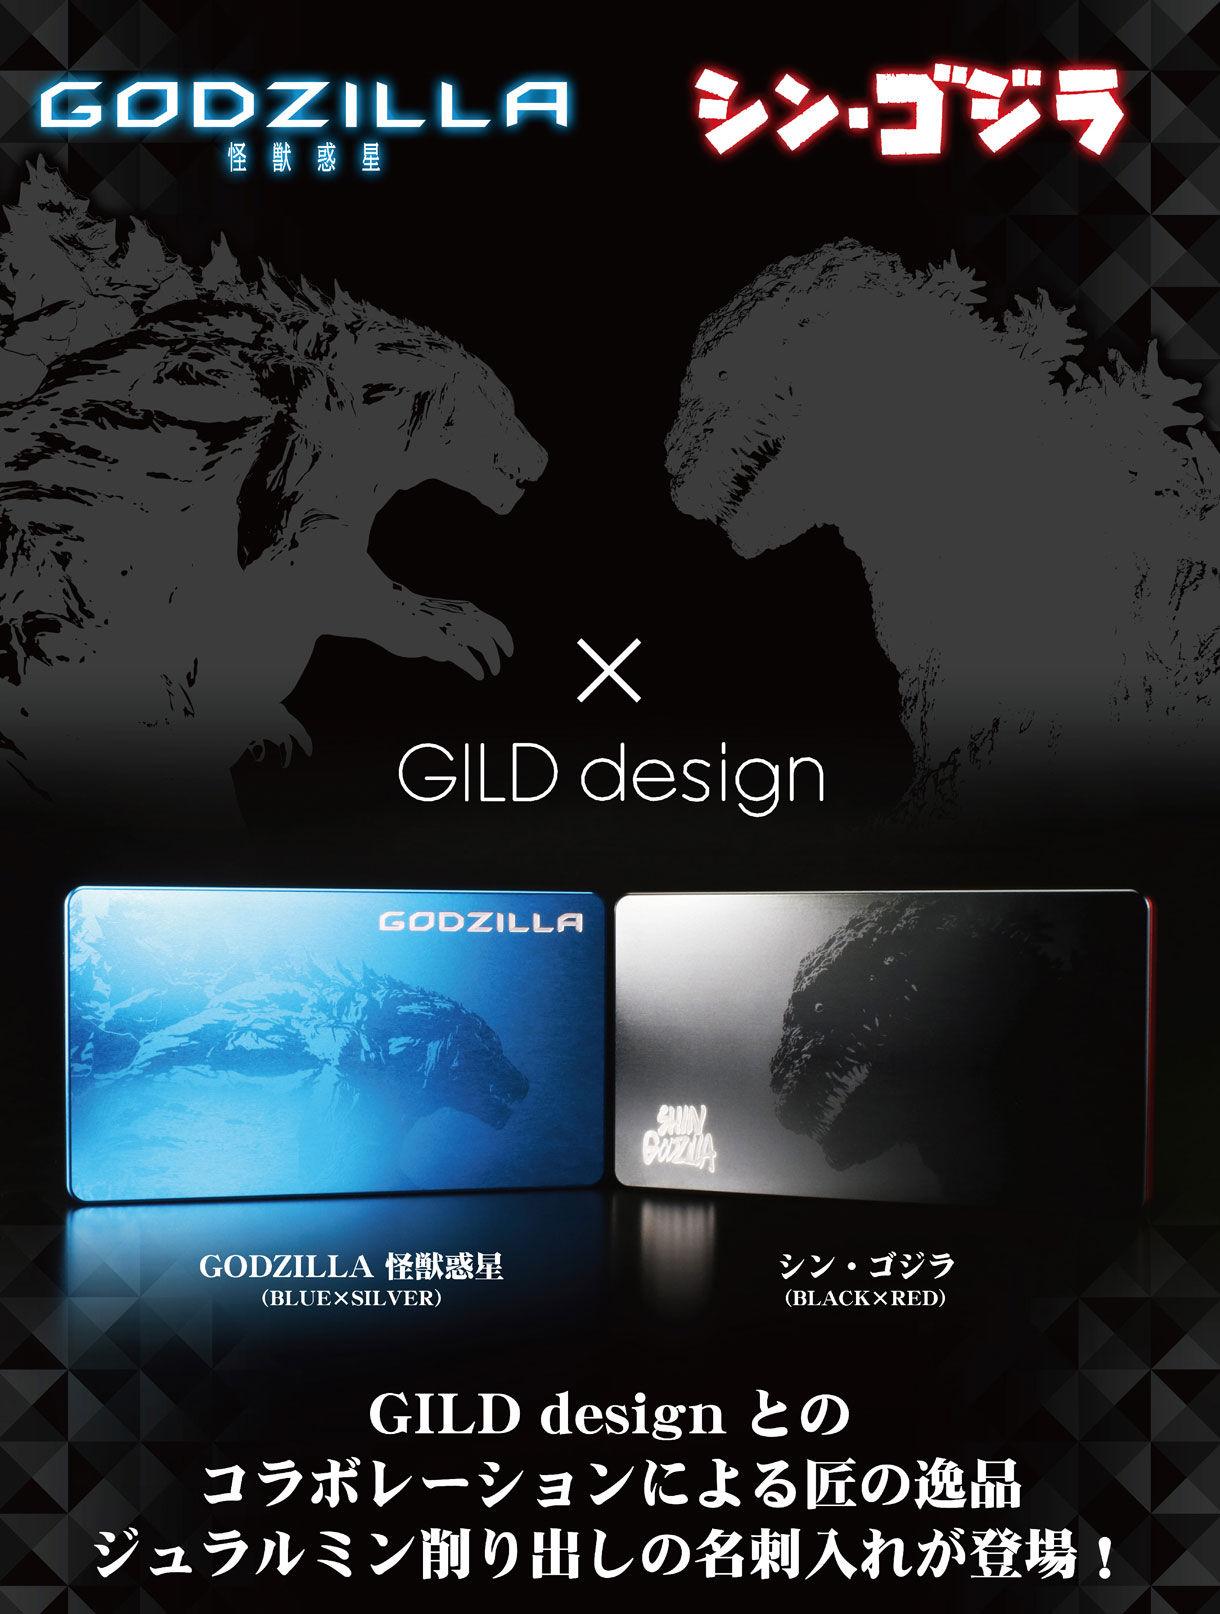 GILD design ジュラルミン削り出し名刺入れ